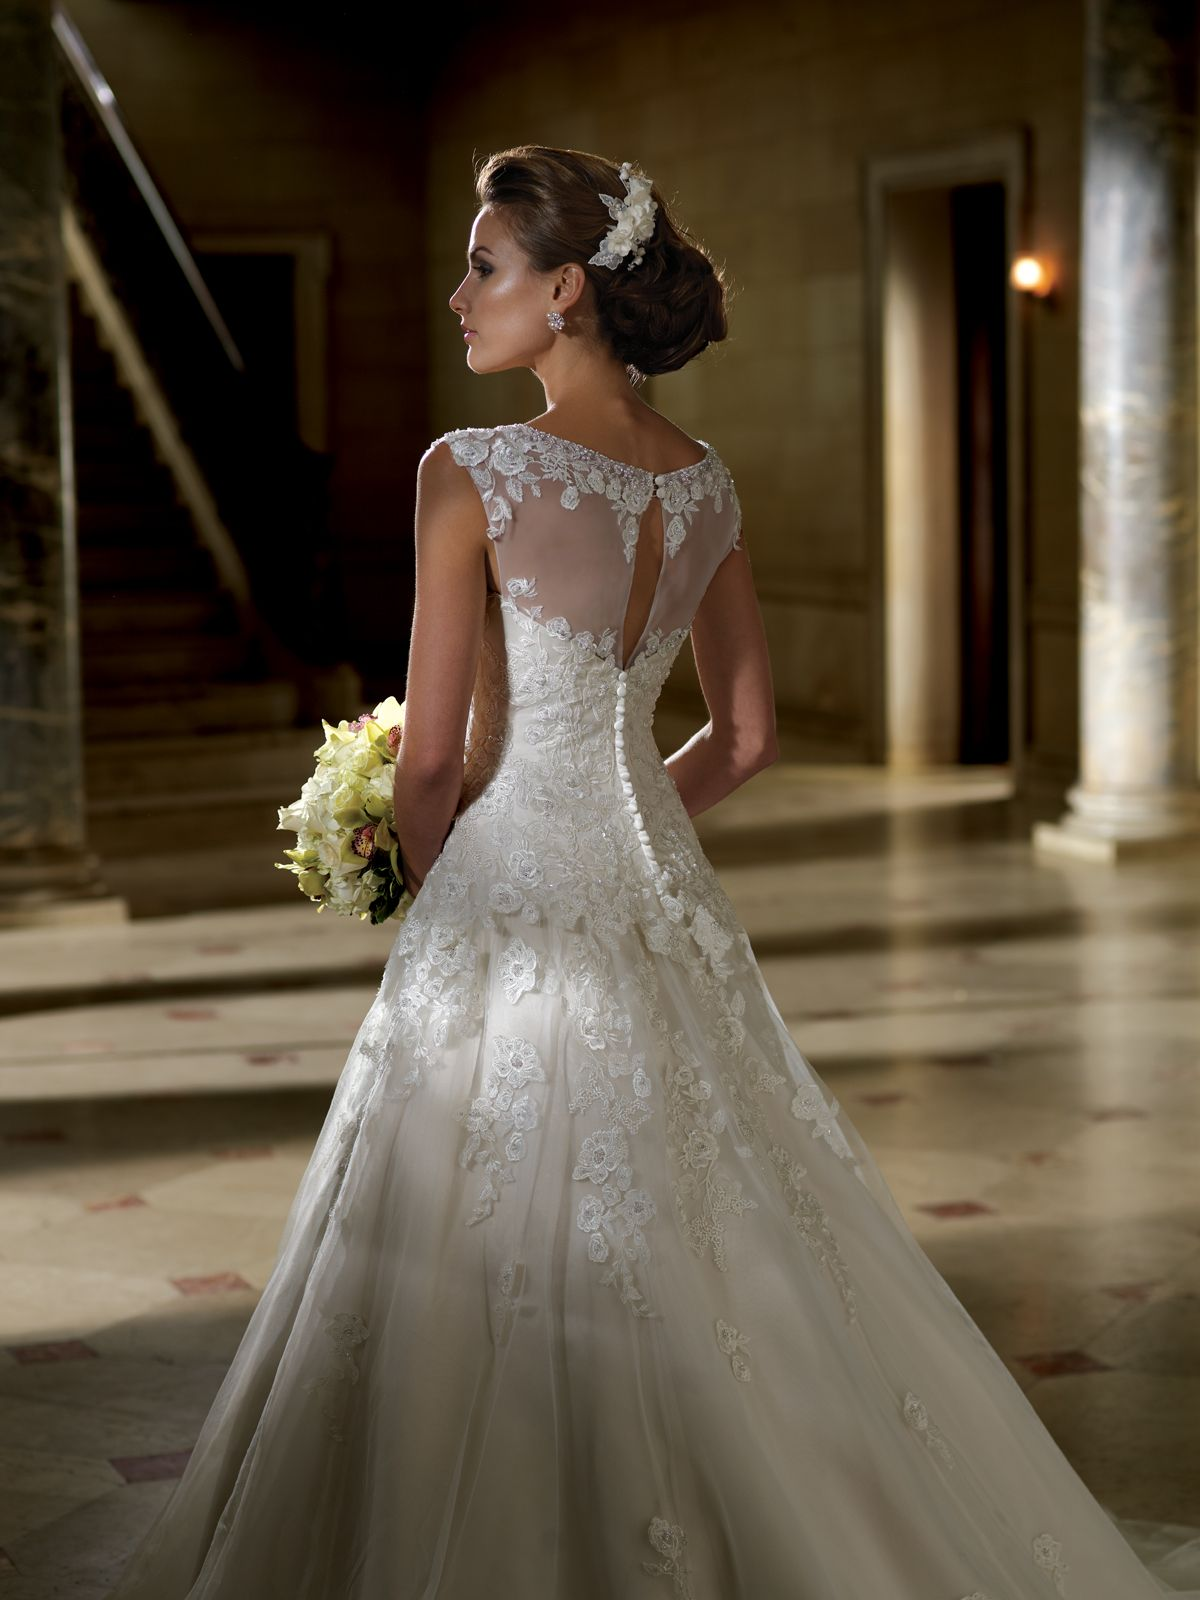 David tutera for mon cheri style no 213248 wedding dresses david tutera for mon cheri style no 213248 wedding dresses 2013 collection ombrellifo Images